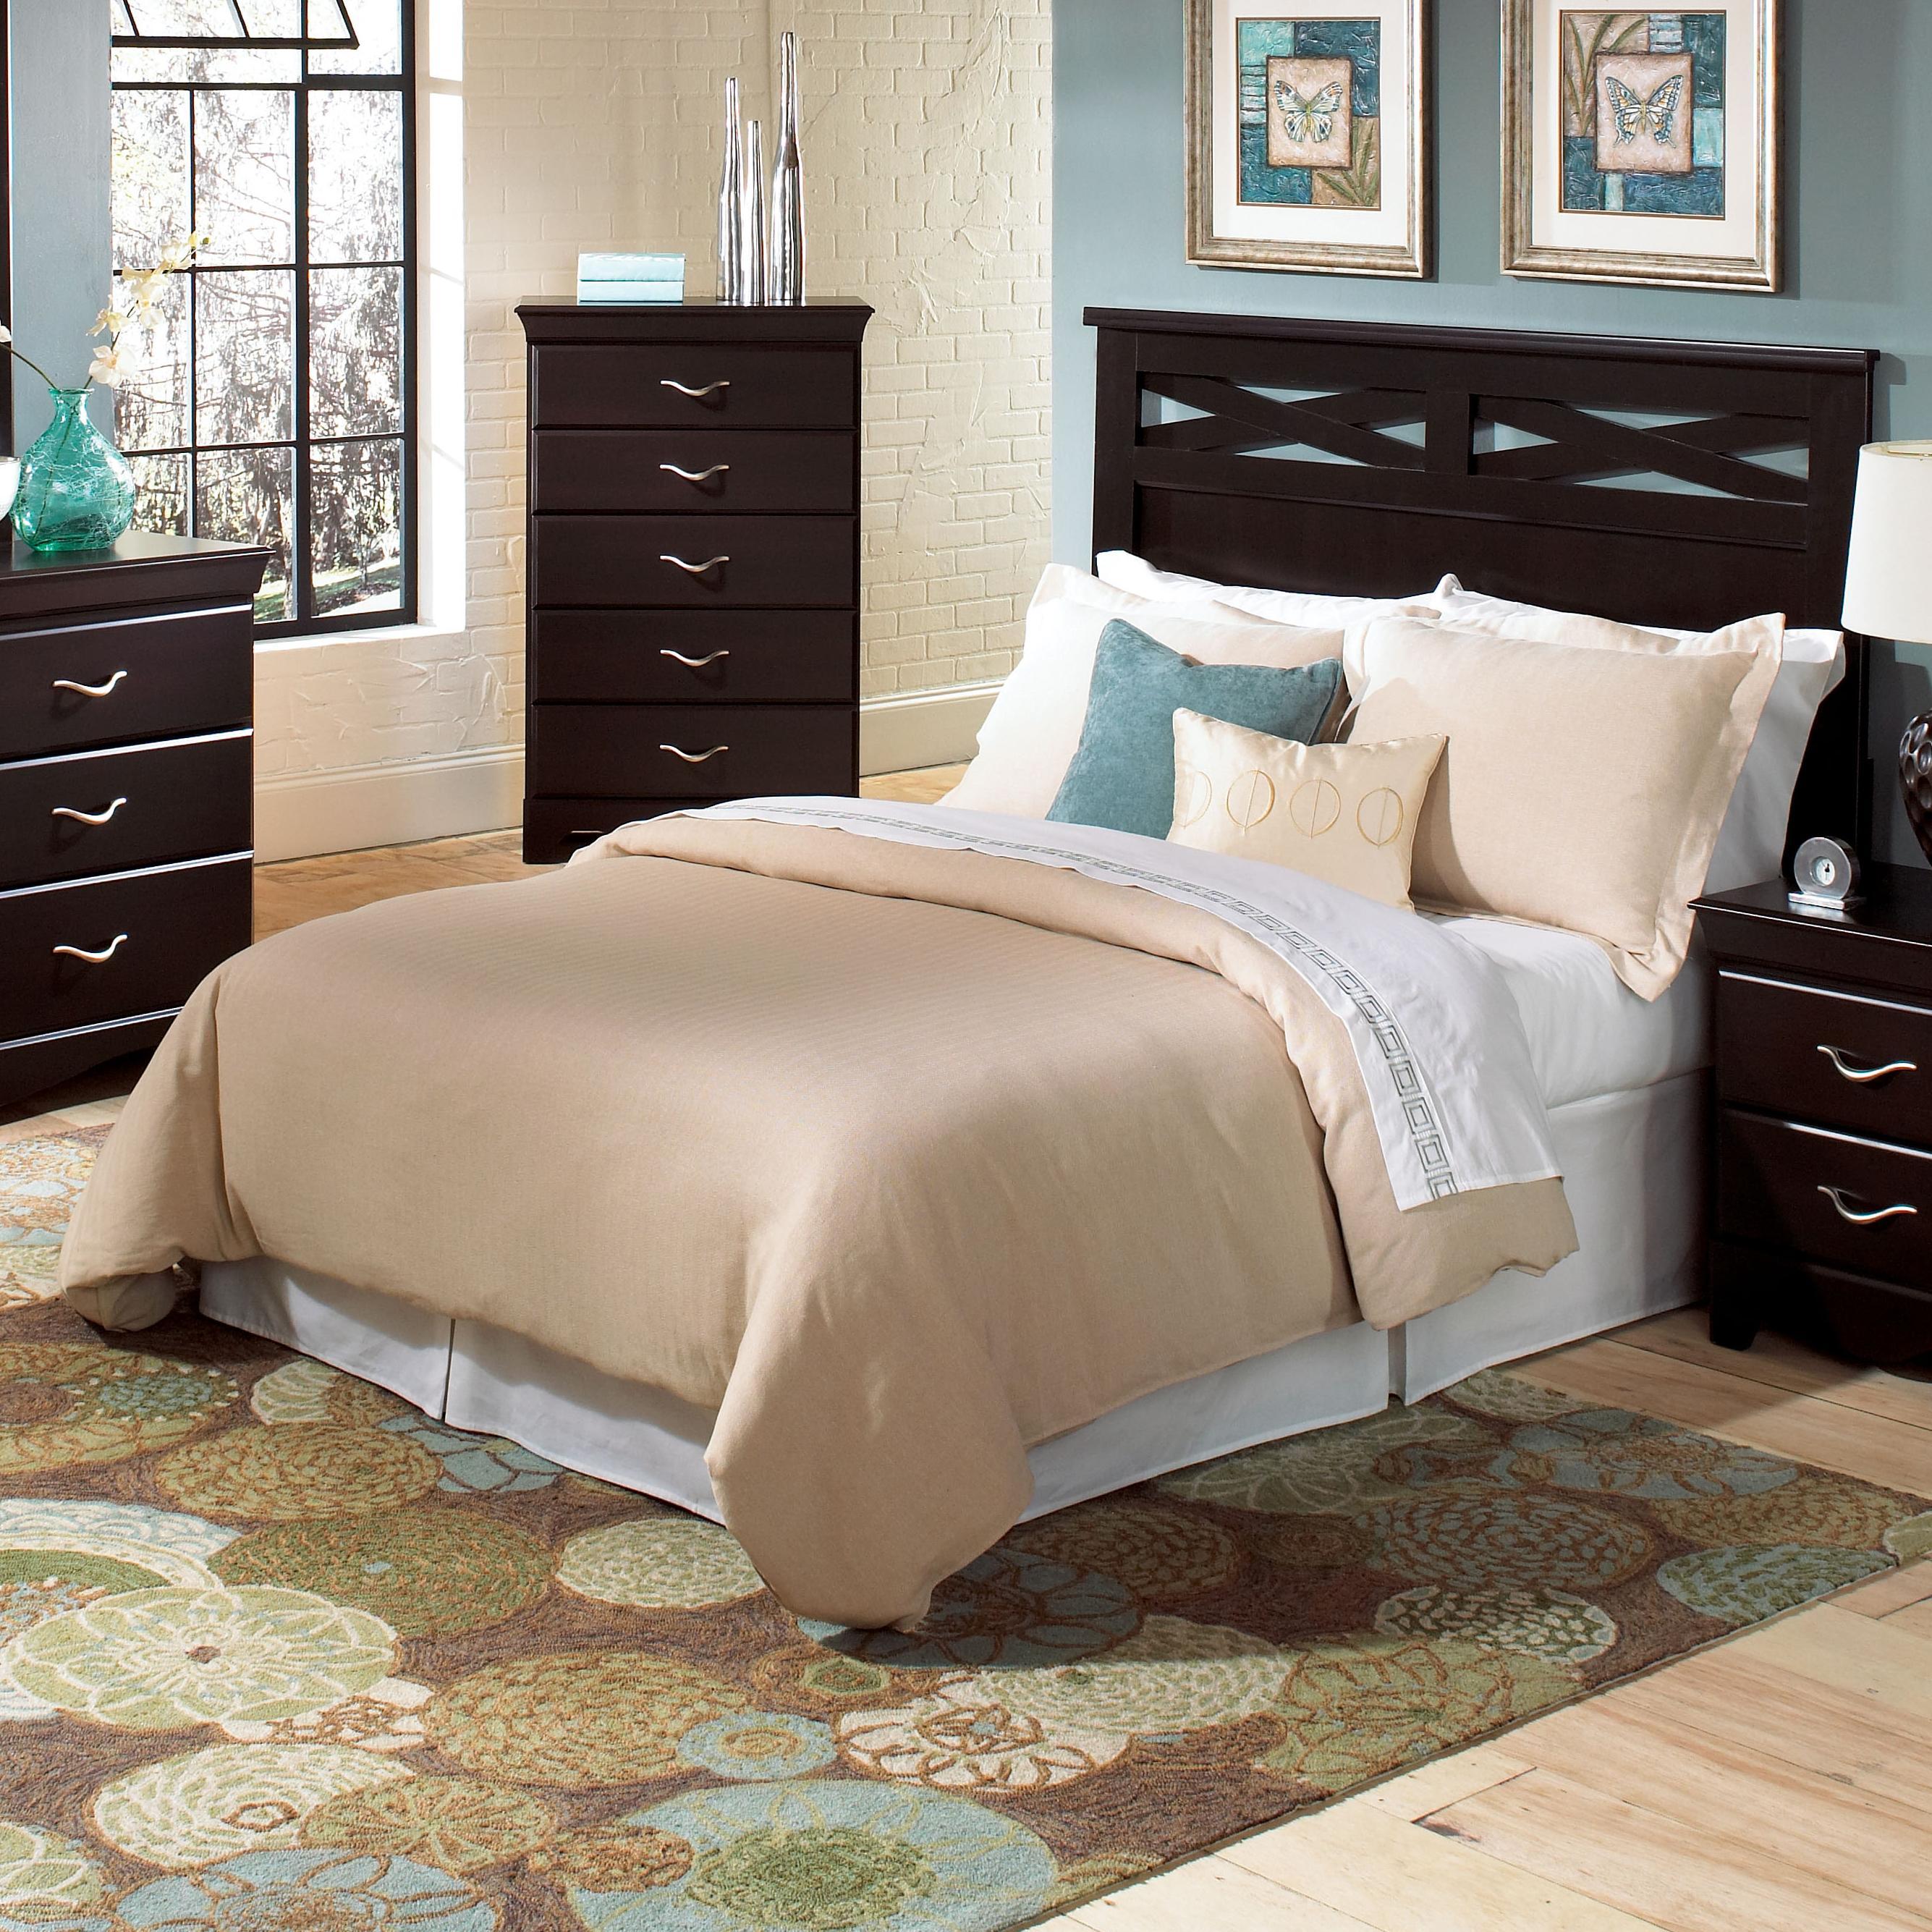 Standard Furniture Crossroads  Full/Queen Panel Headboard  - Item Number: 57651